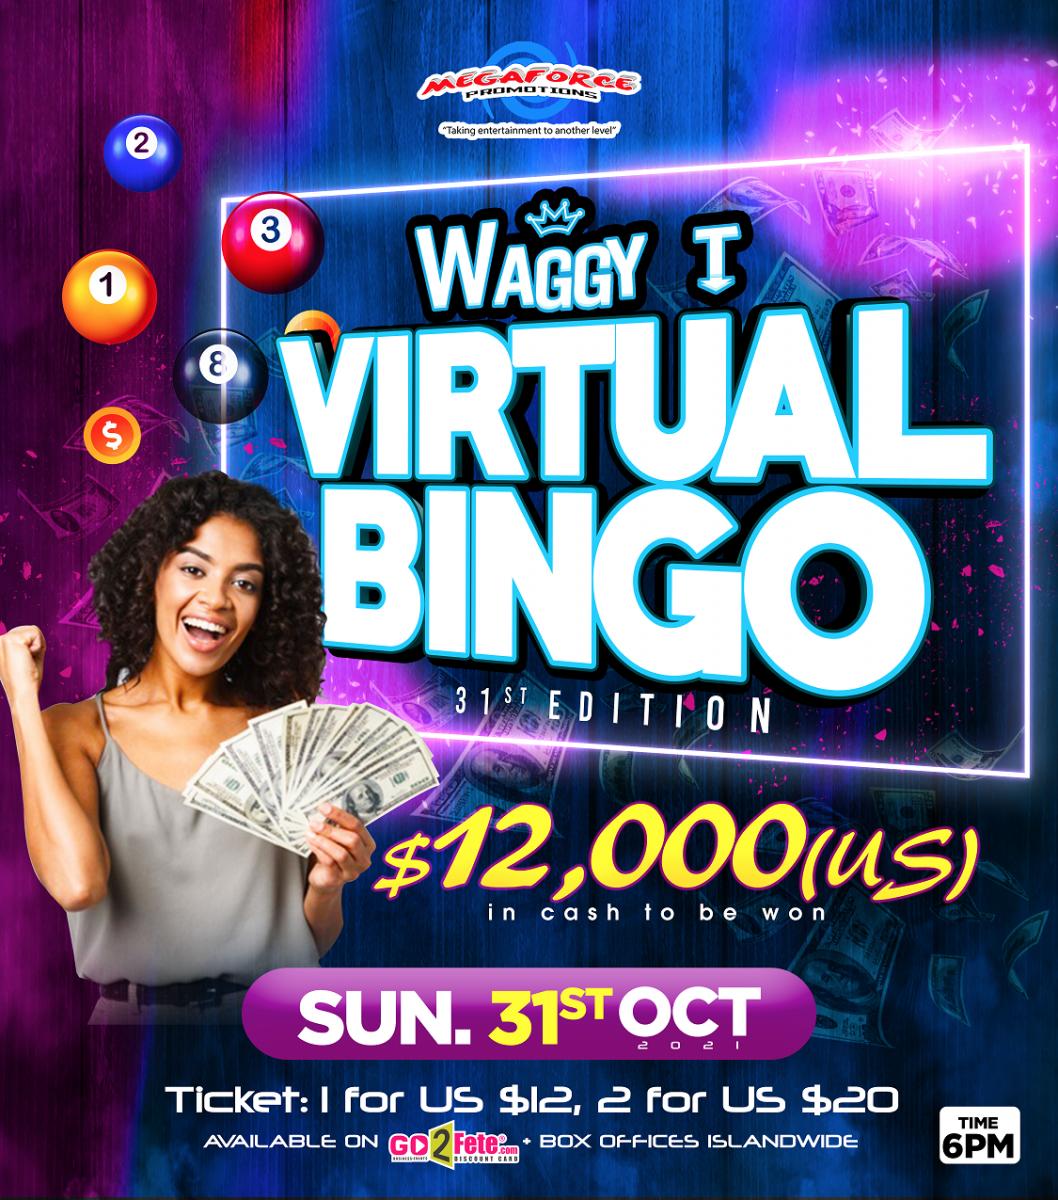 Waggy T Virtual Bingo - 31ED - Oct 31st